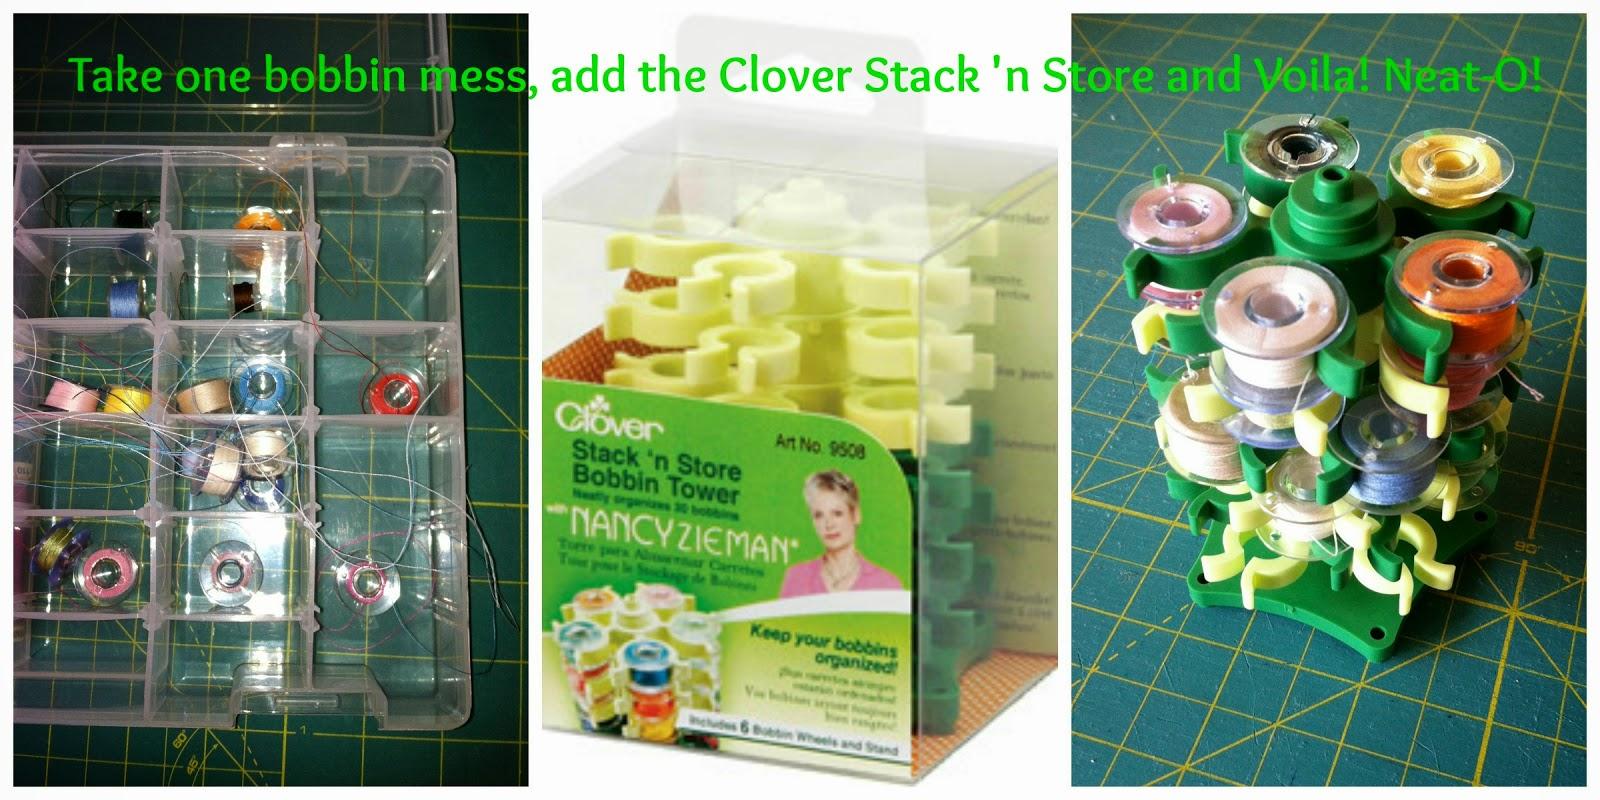 Stack and store bobbins